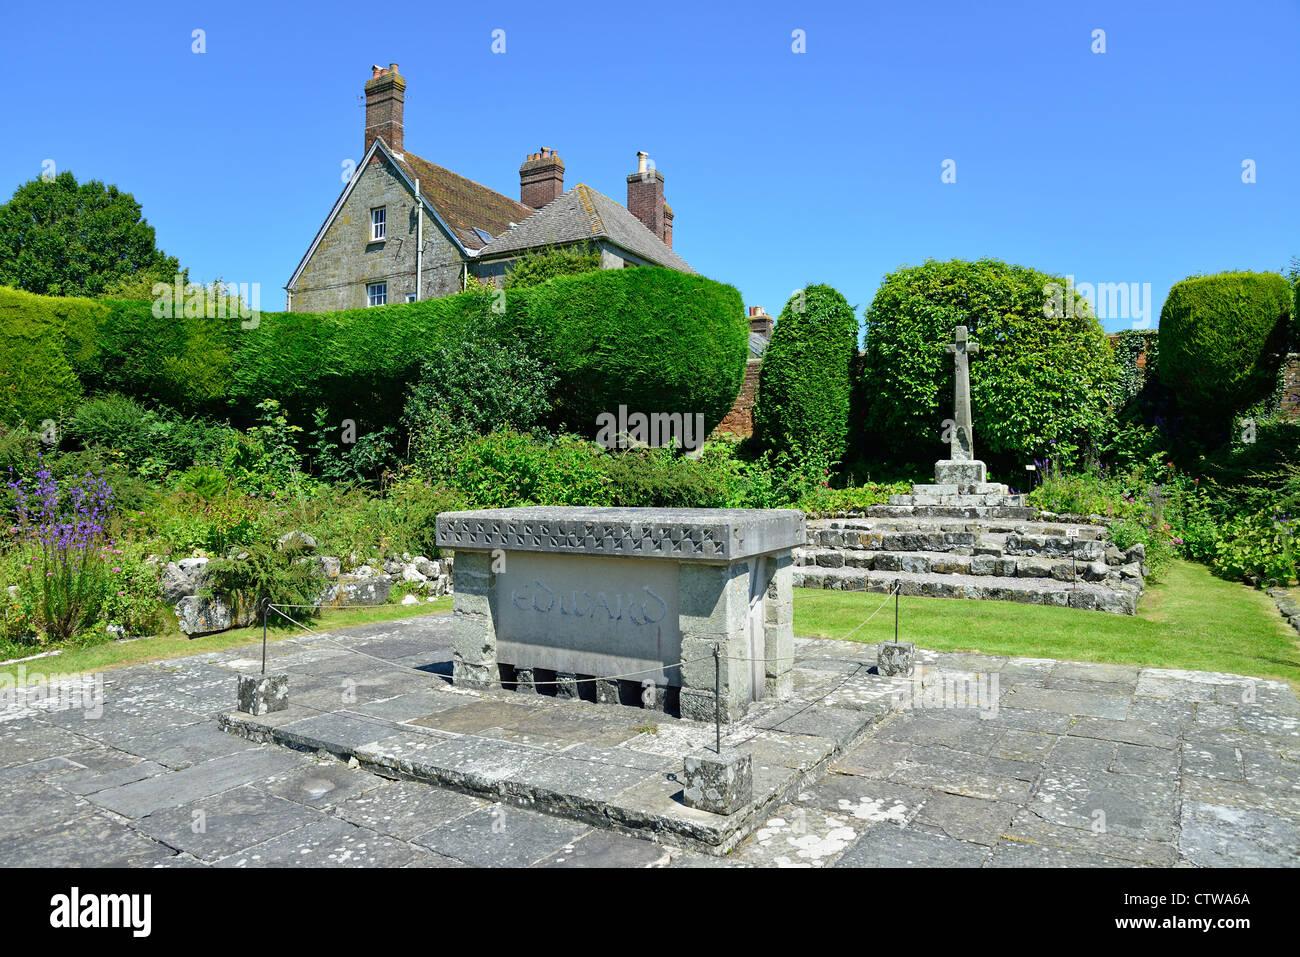 Shaftesbury Abbey Museum & Gardens, Park Walk, Shaftesbury, Dorset, England, United Kingdom Stock Photo